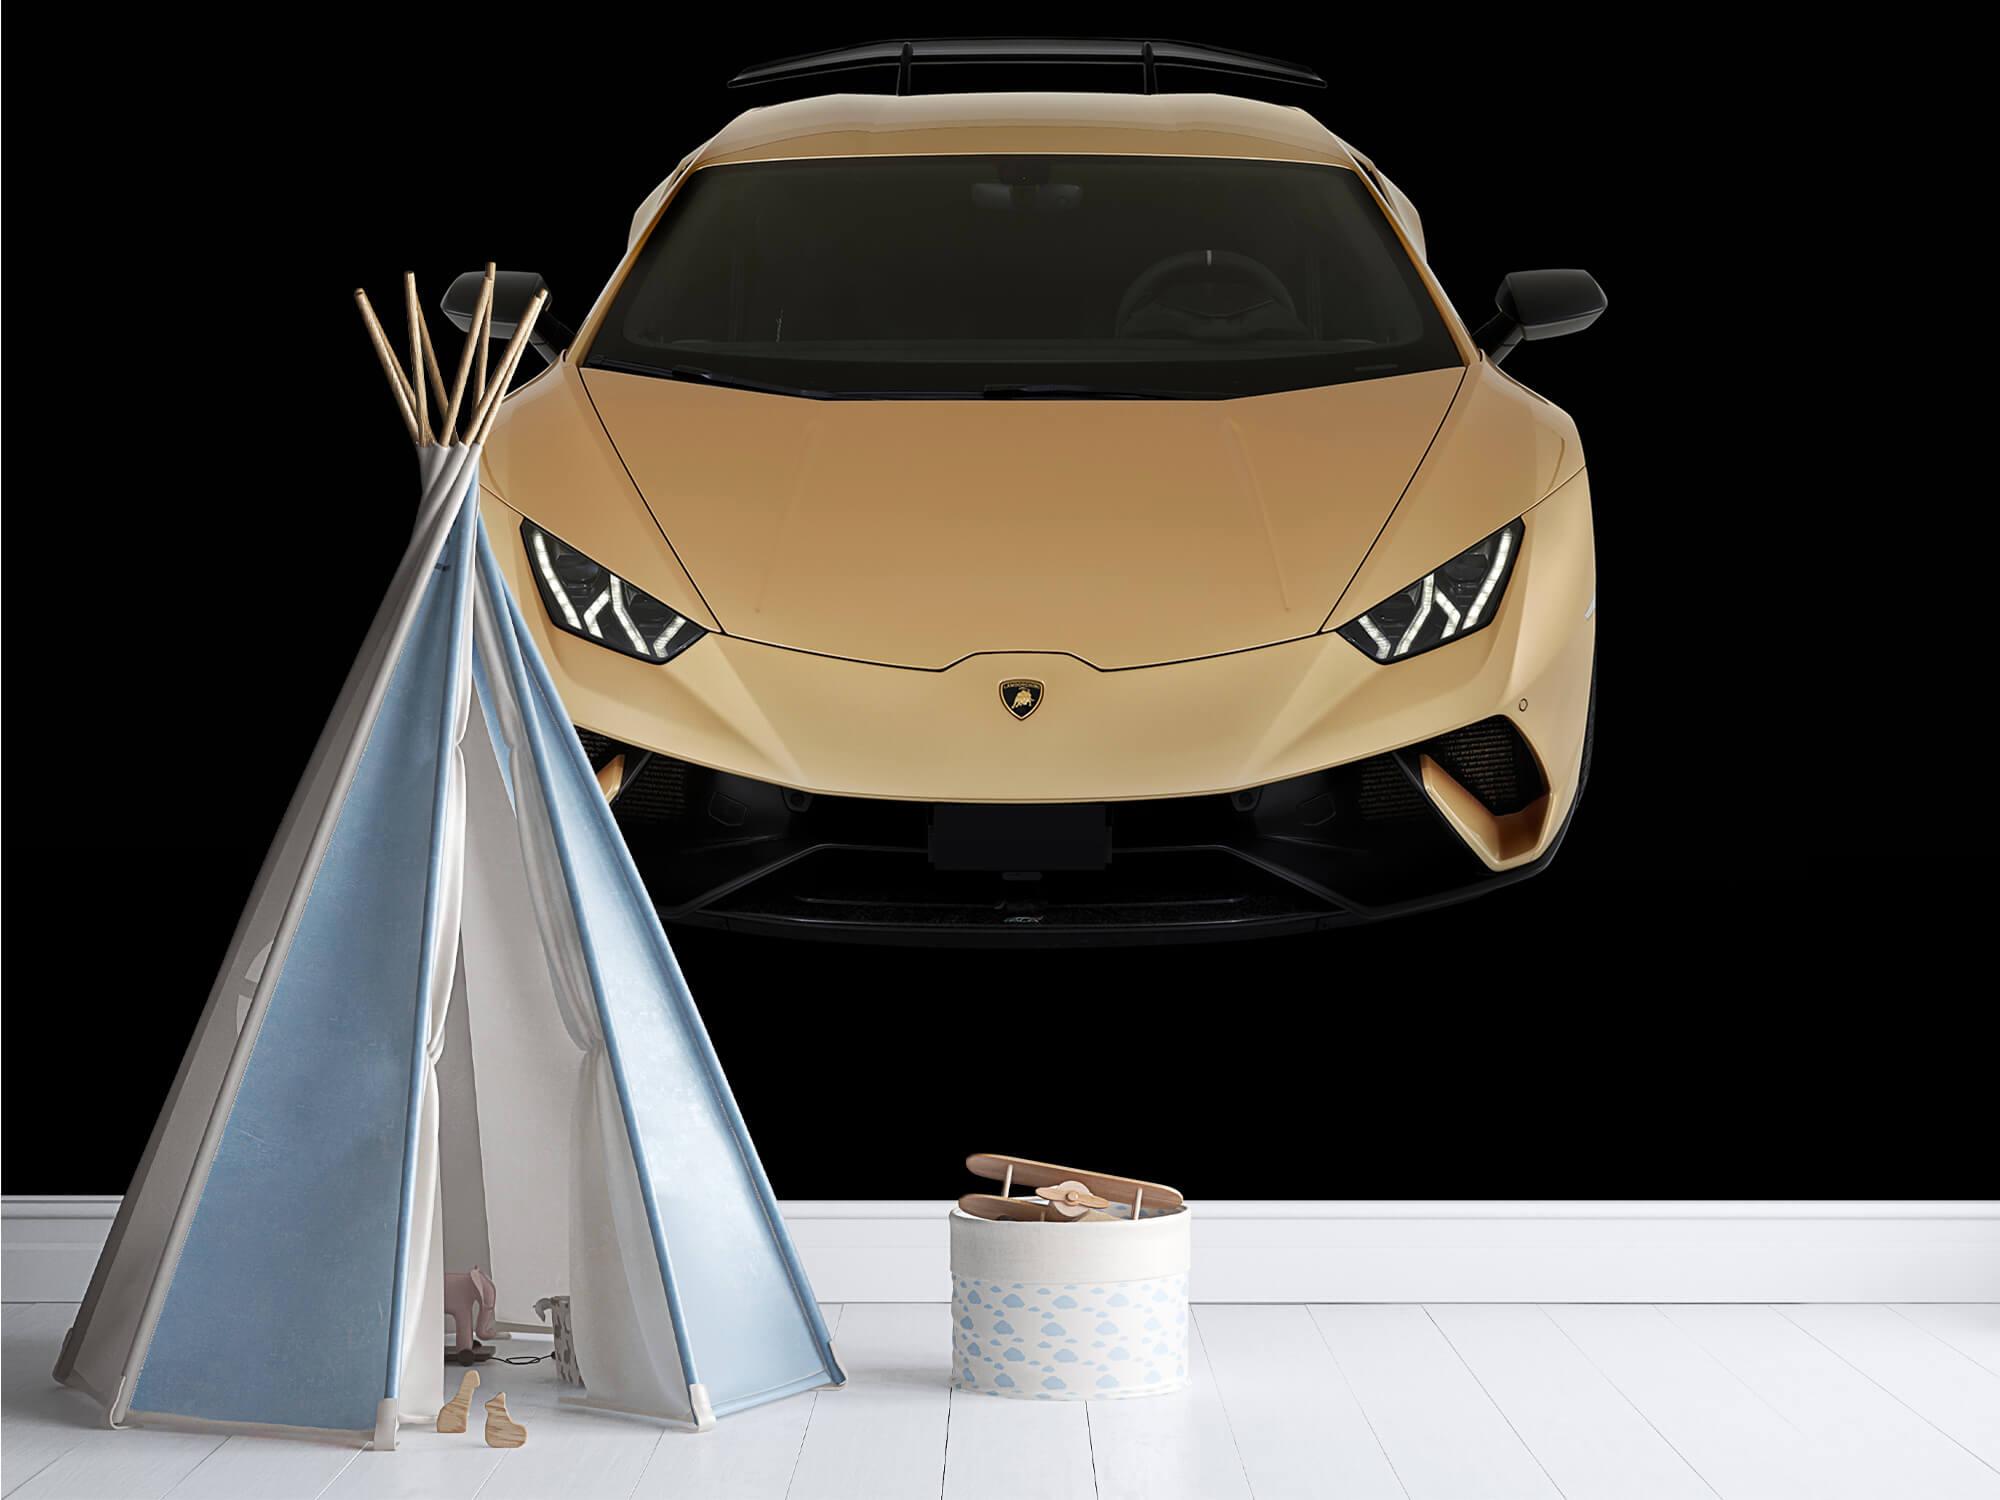 Wallpaper Lamborghini Huracán - Front from above, black 1